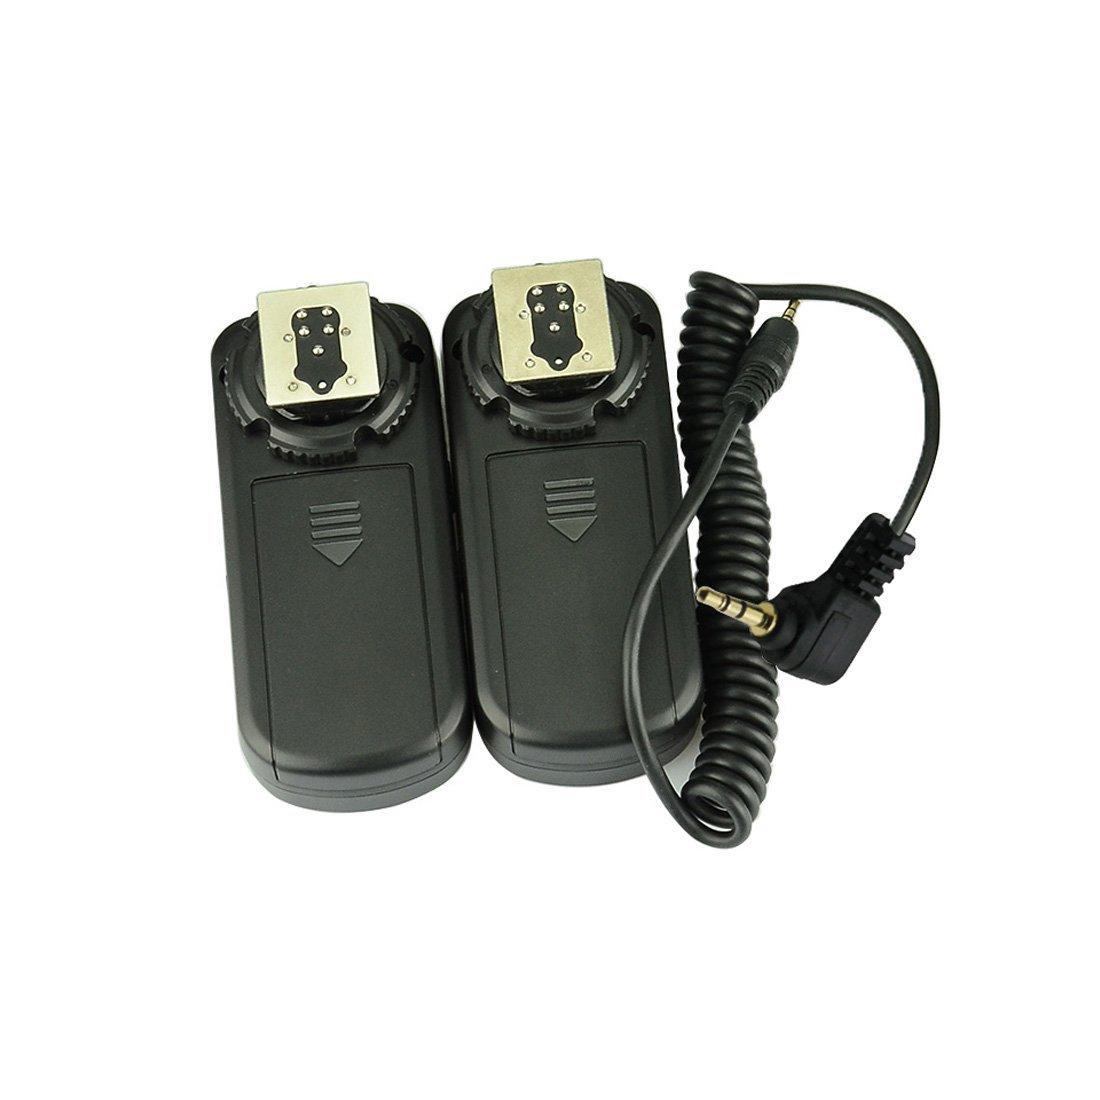 K5IIs,K7,K30,K50 K5 K500,K100D 645D K3II K3 Pentax KP as FK K-70 K-S1,K-S2,Pentax Q,Q10,Q-S1 JJC Hot Shoe Cover Protector Cap for Pentx 645Z K100D,Super K200D K5II